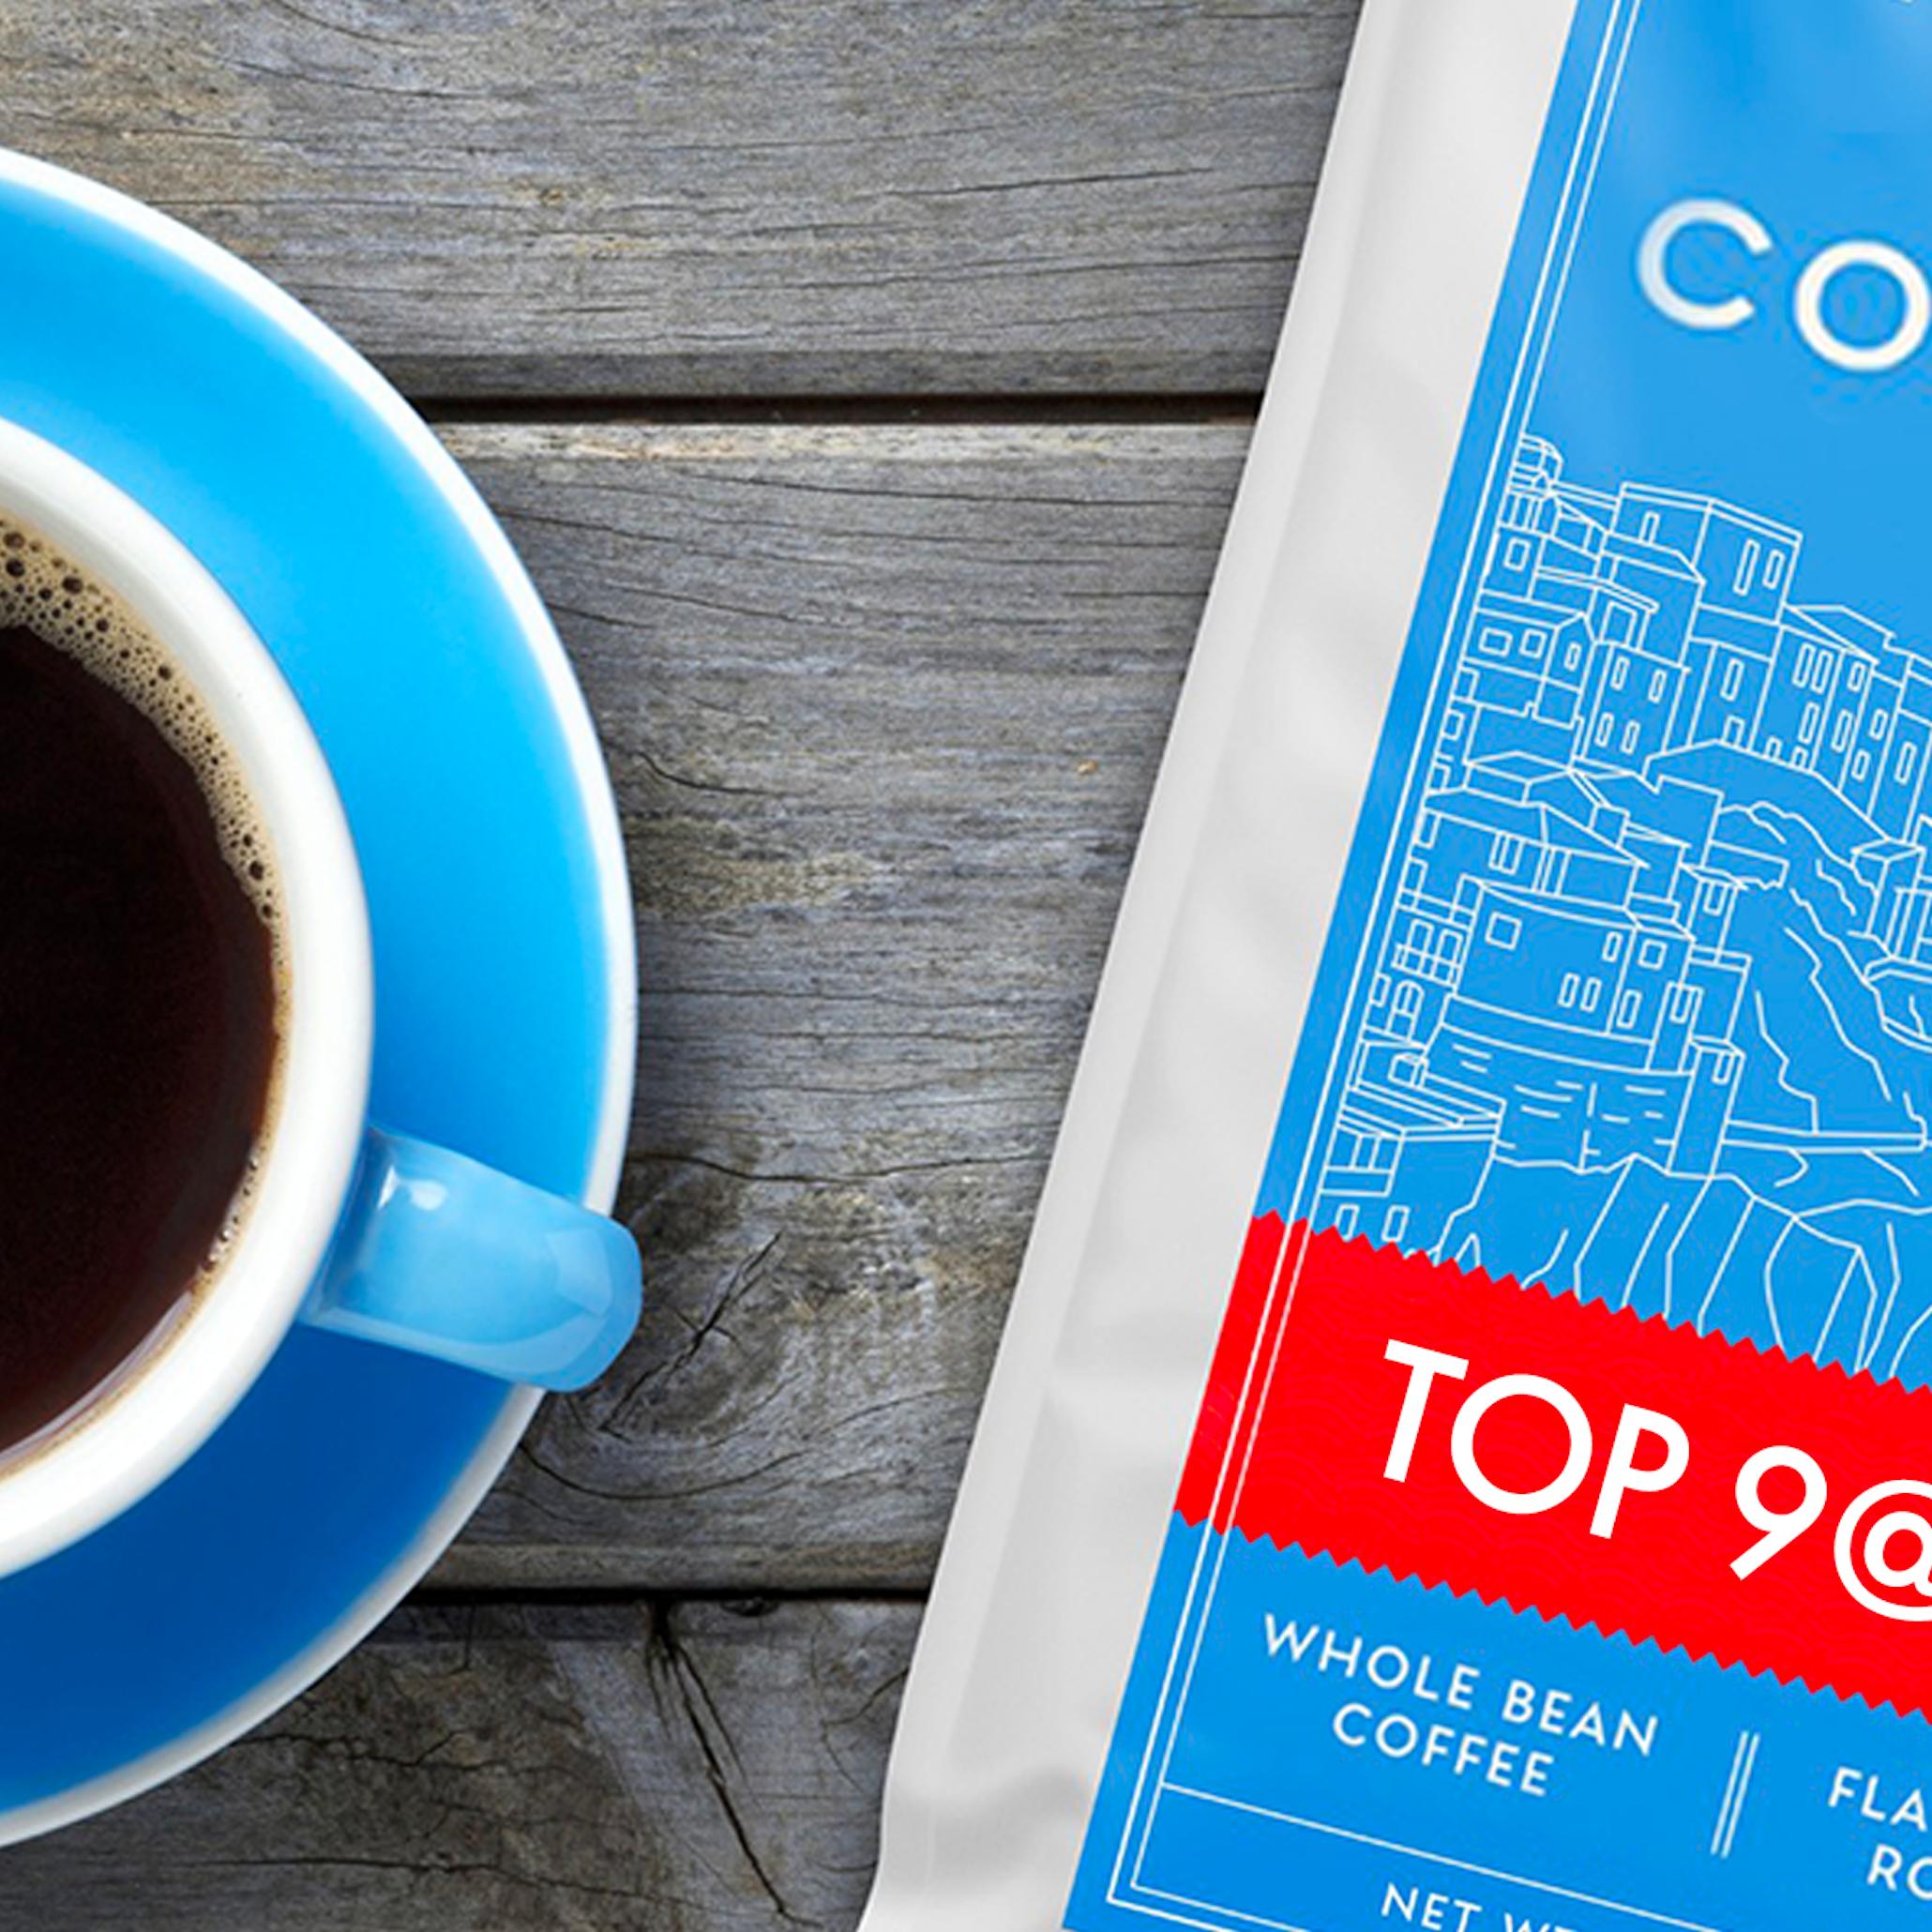 Novembers Top 9 At 99 Coffee Design 99designs